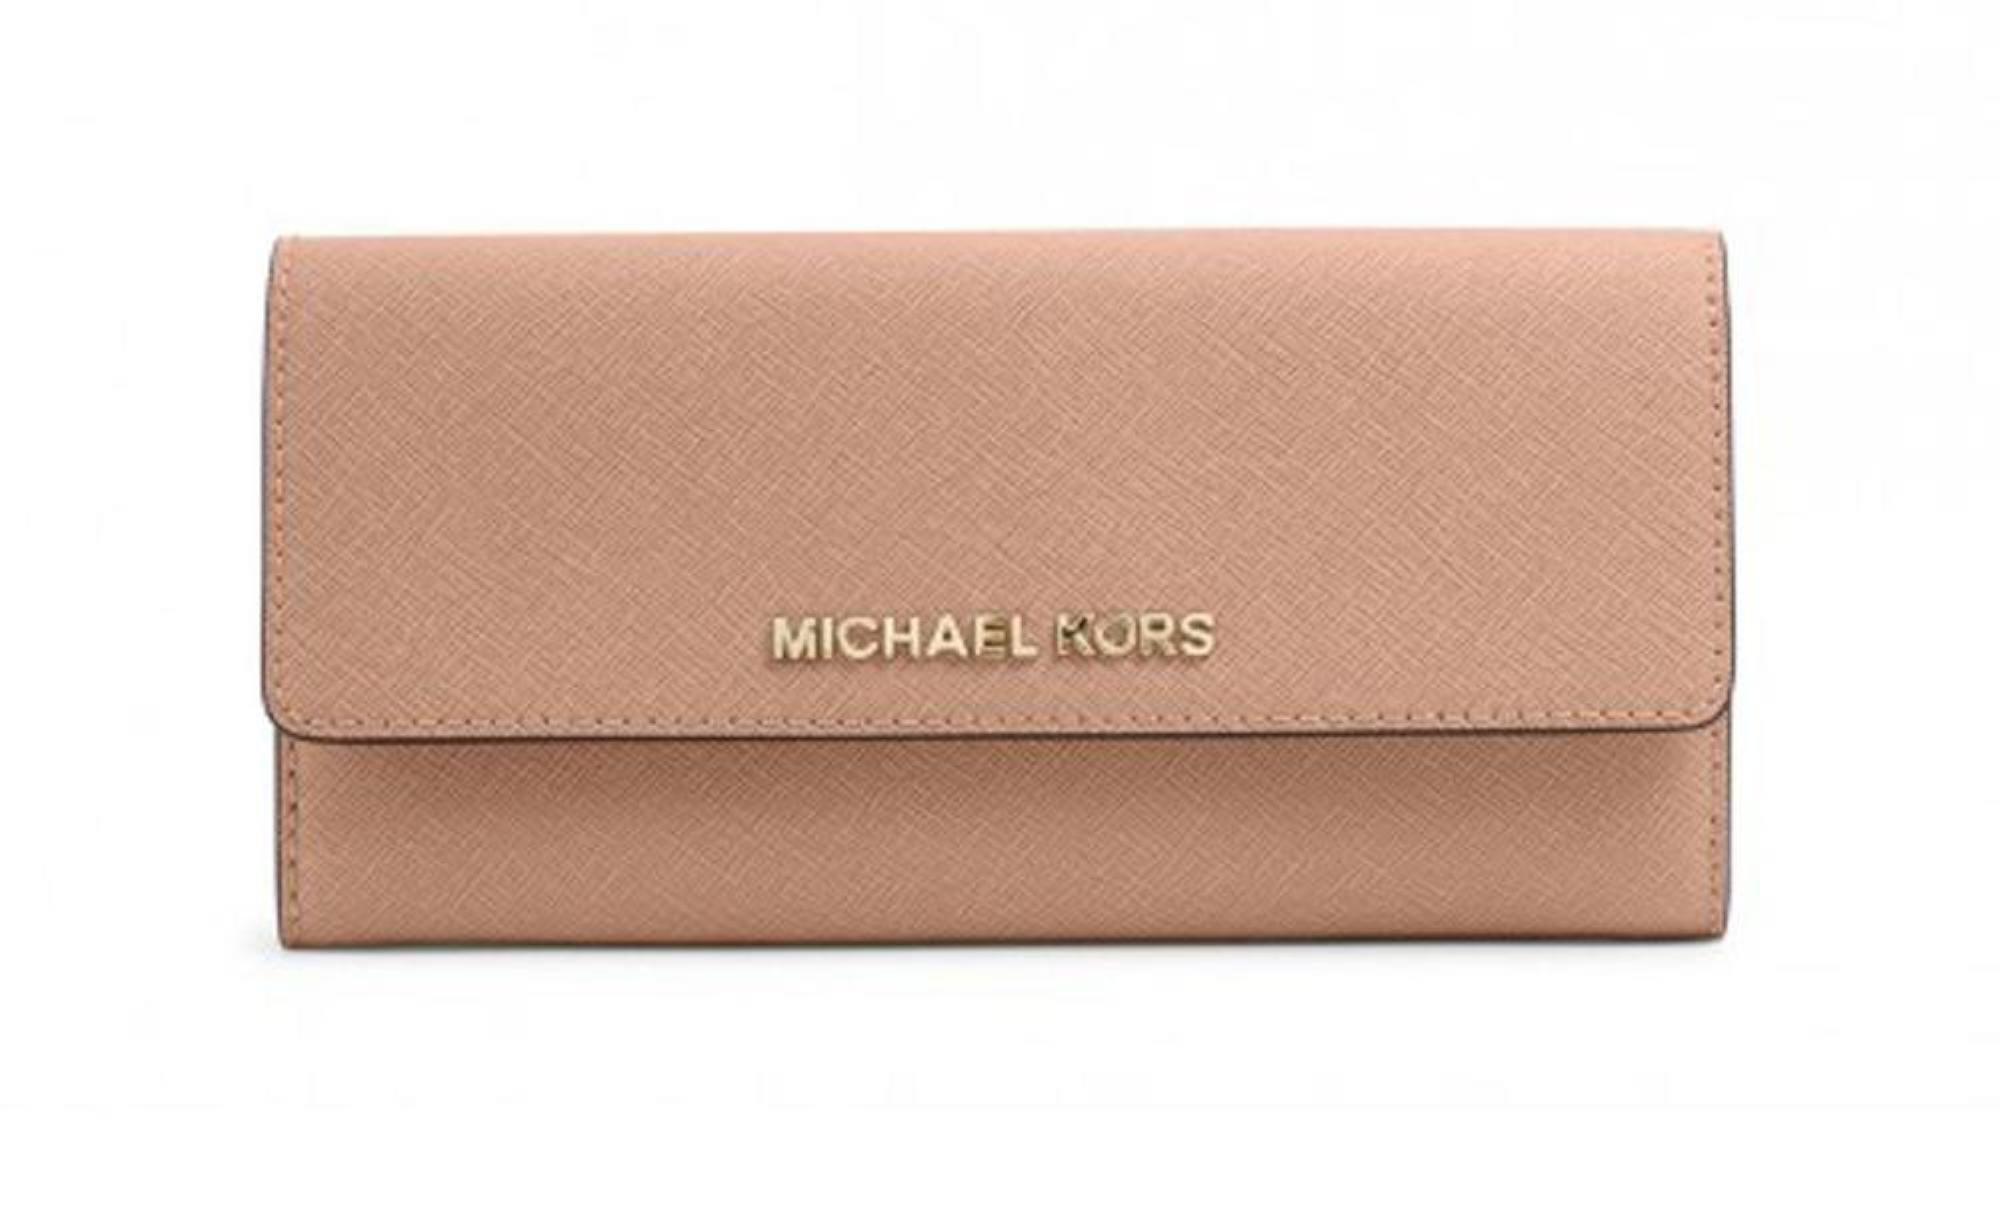 Michael Kors Women's Jet Set Travel Flap Navy Blue Saffiano Leather Continental Carryall Wallet